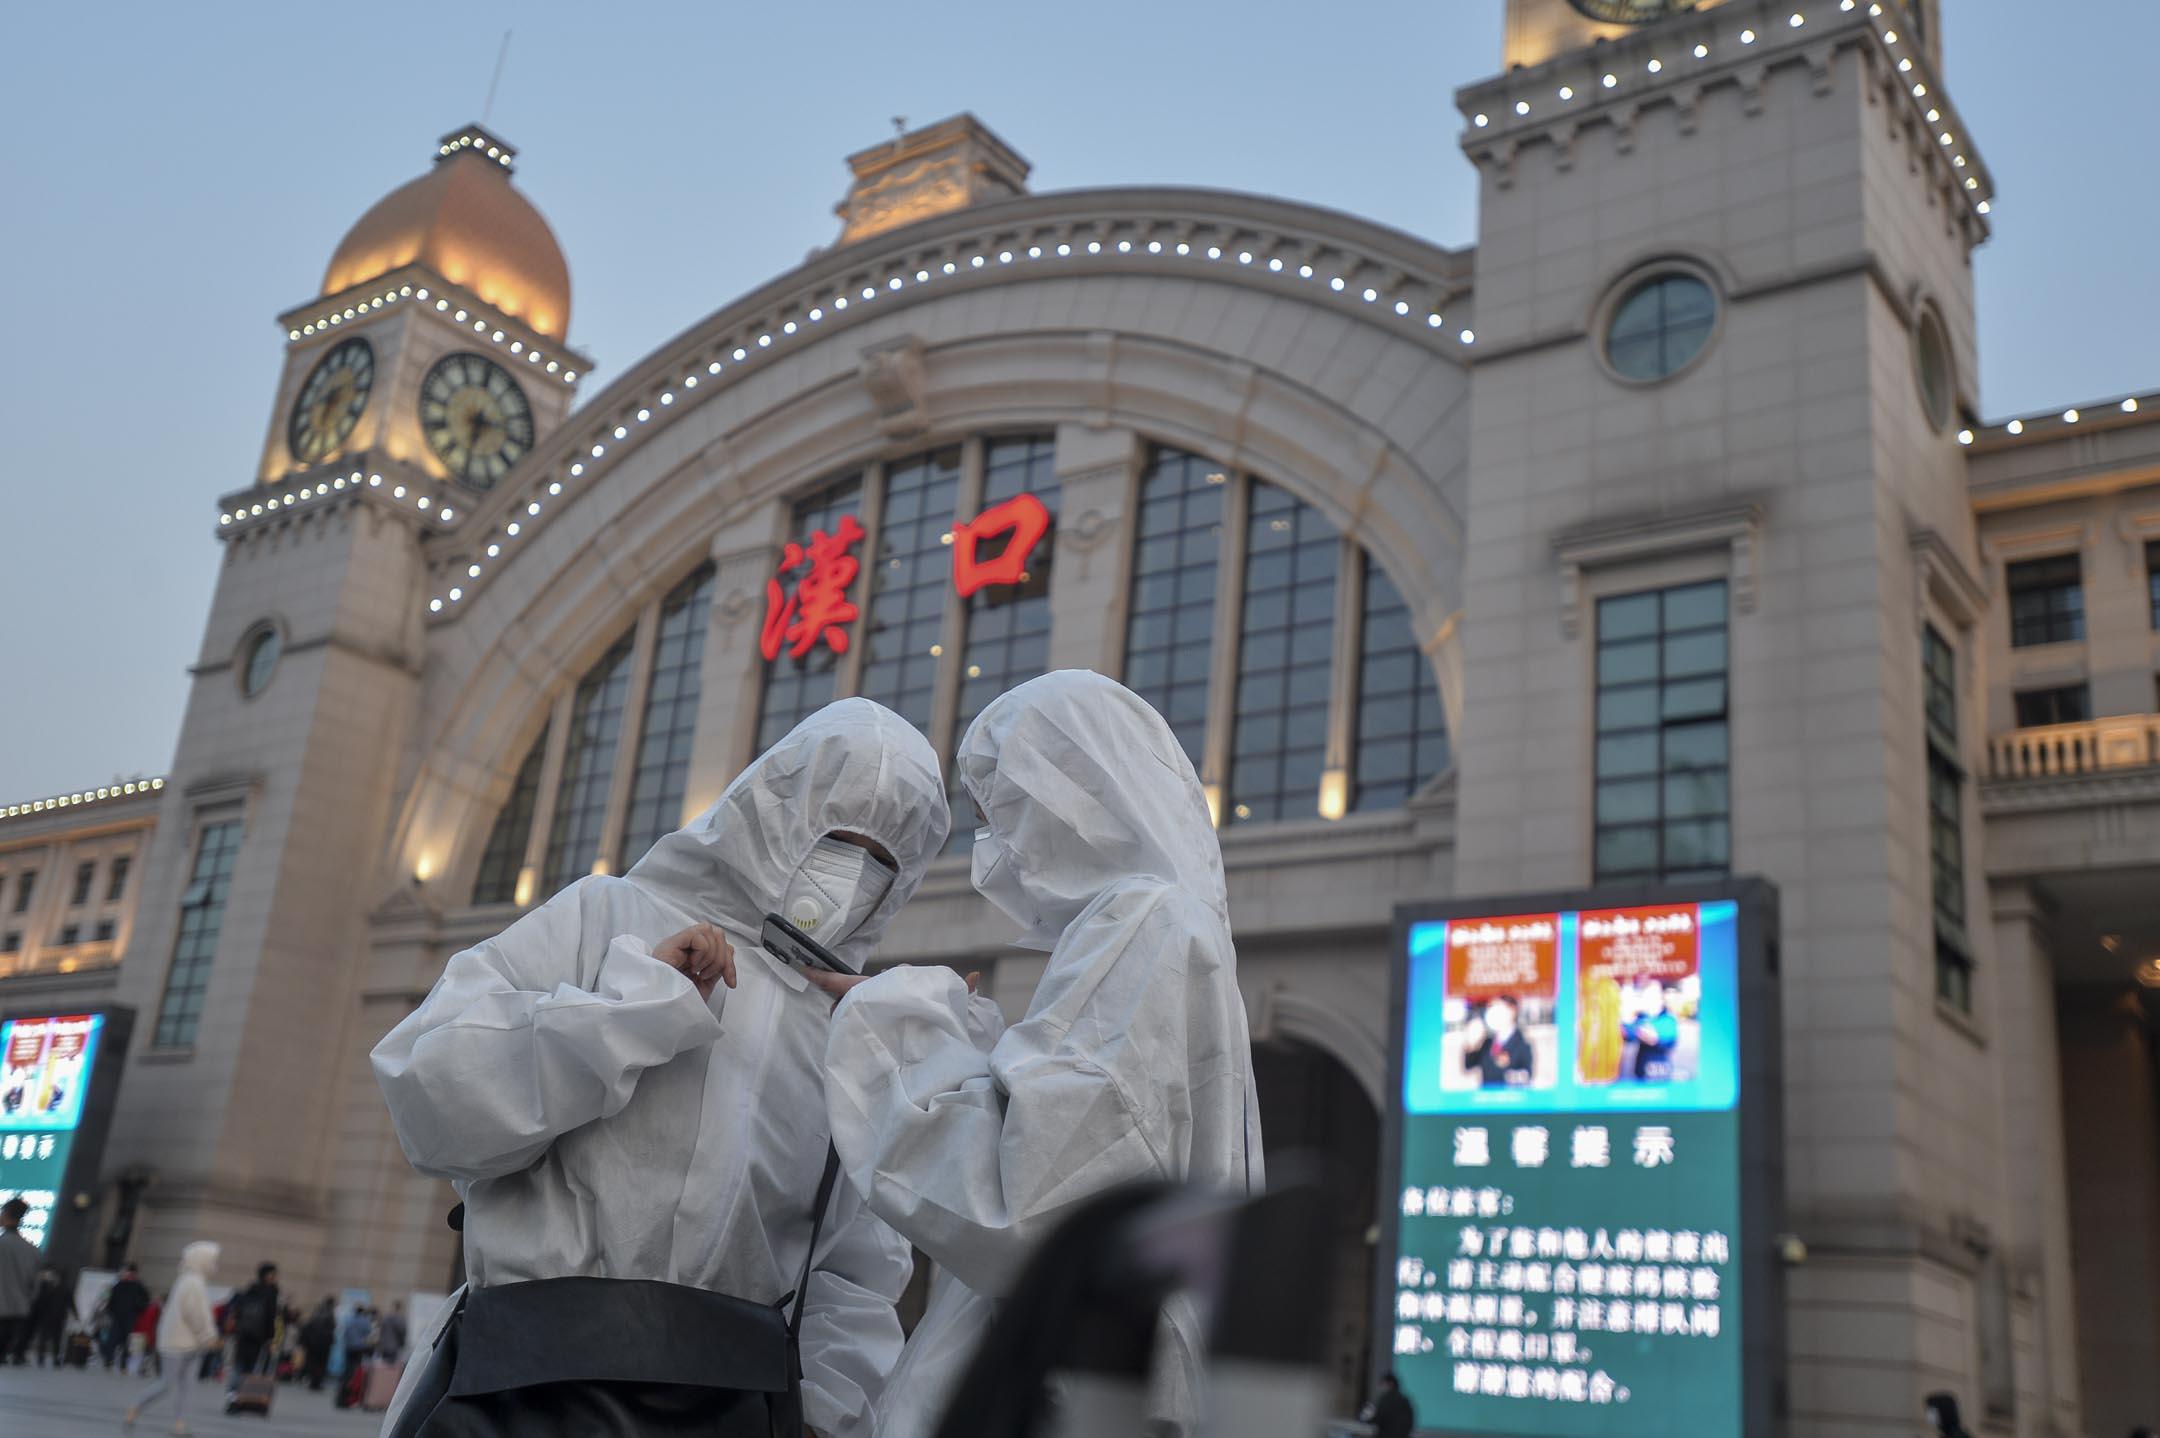 2020年4月8日,武漢解封第一天,兩名穿著防護衣的旅客在漢口火車站準備入站乘火車離開。 攝:Feature China/Barcroft Media via Getty Images